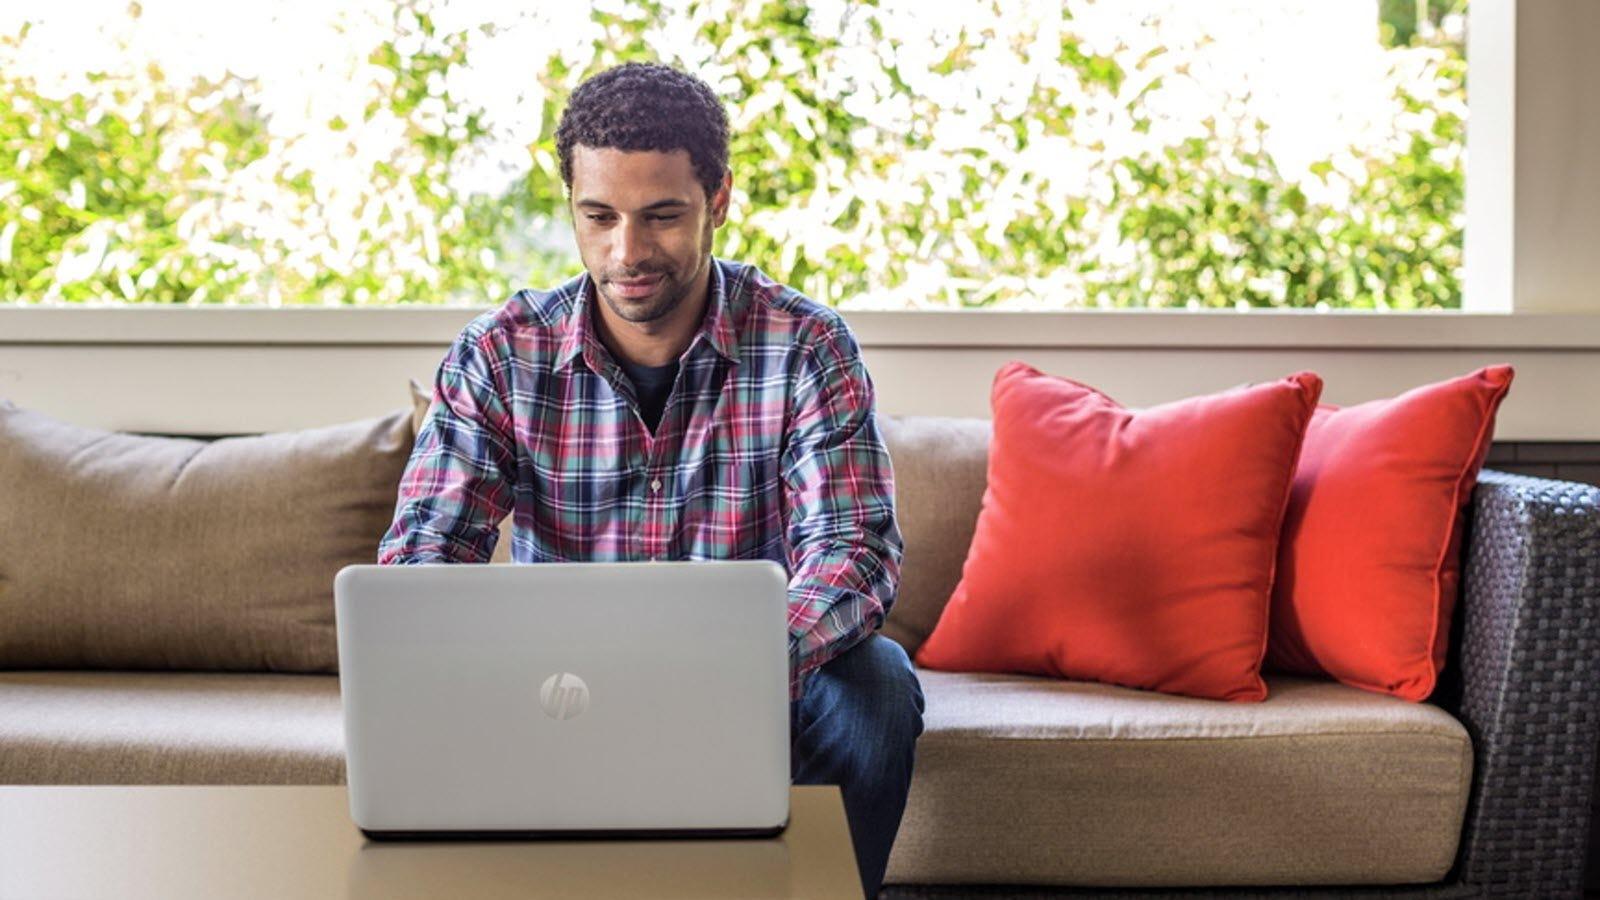 A man looking at an HP EliteBook laptop.